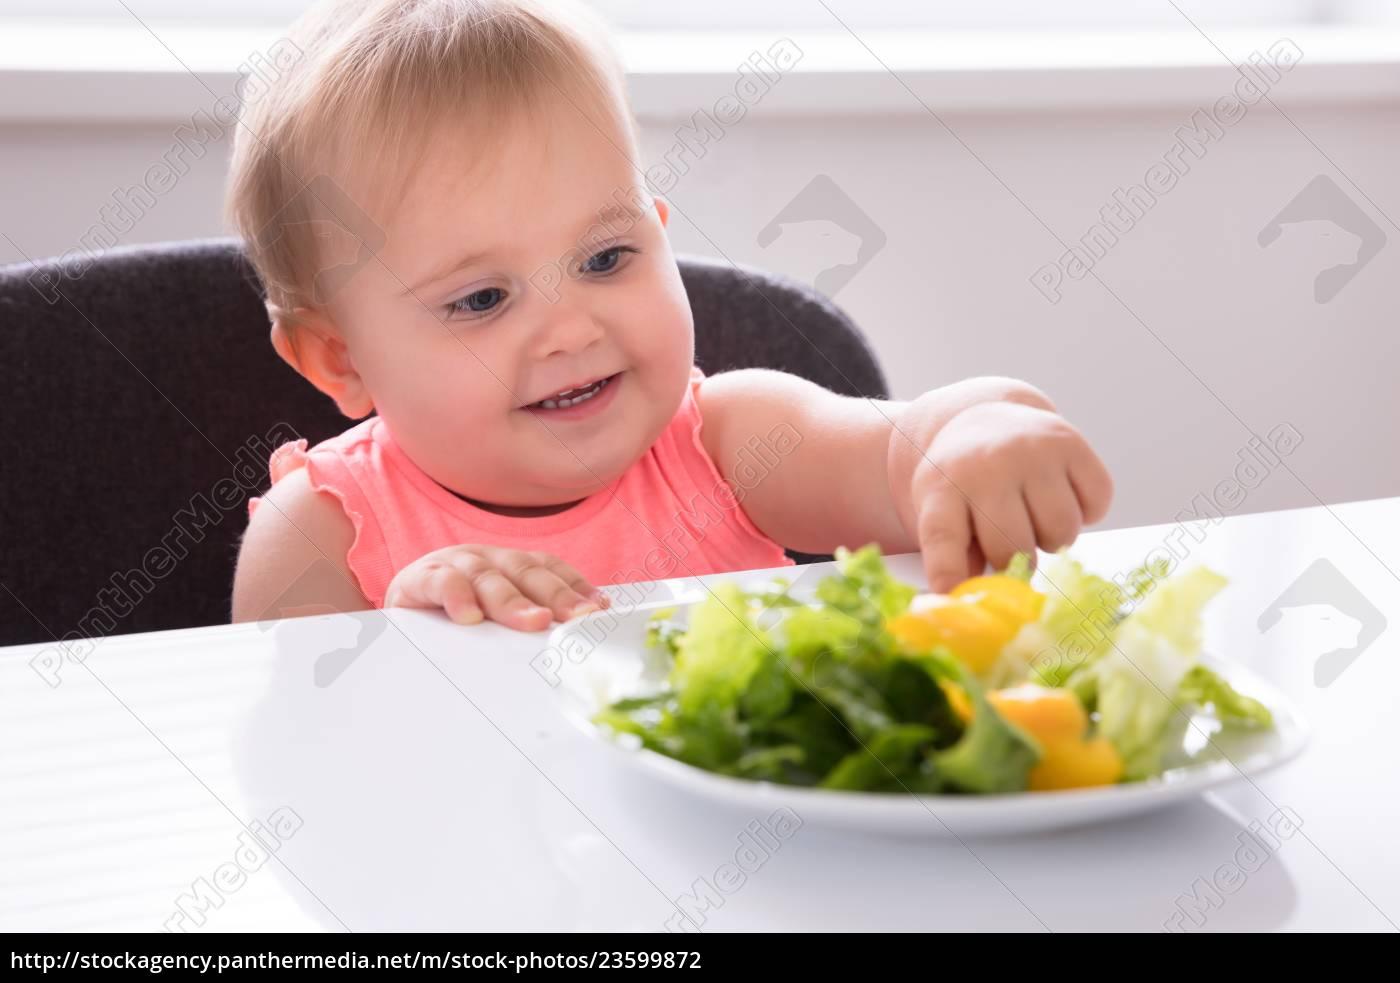 baby, girl, eating, vegetable - 23599872